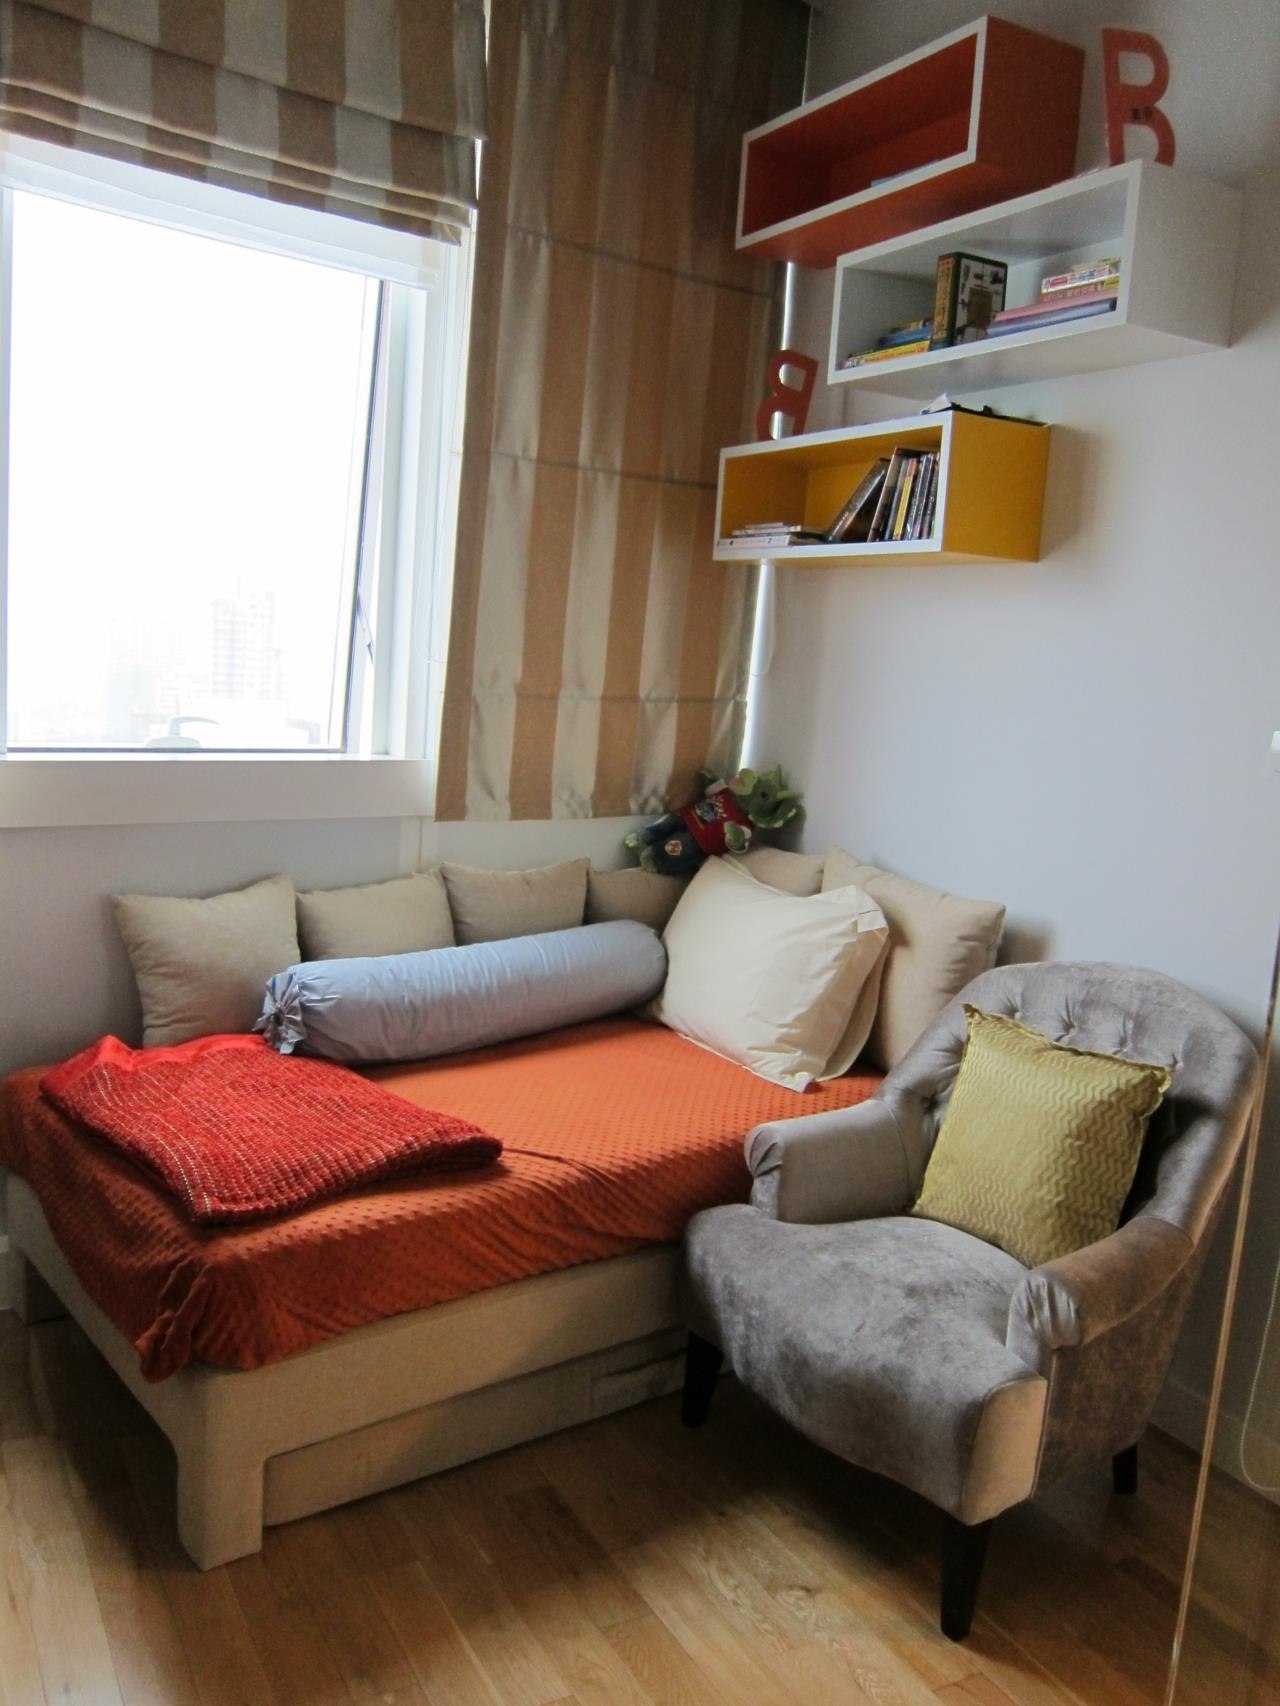 Piri Property Agency's 2 bedrooms Condominium  on tower B floor For Rent 2 5